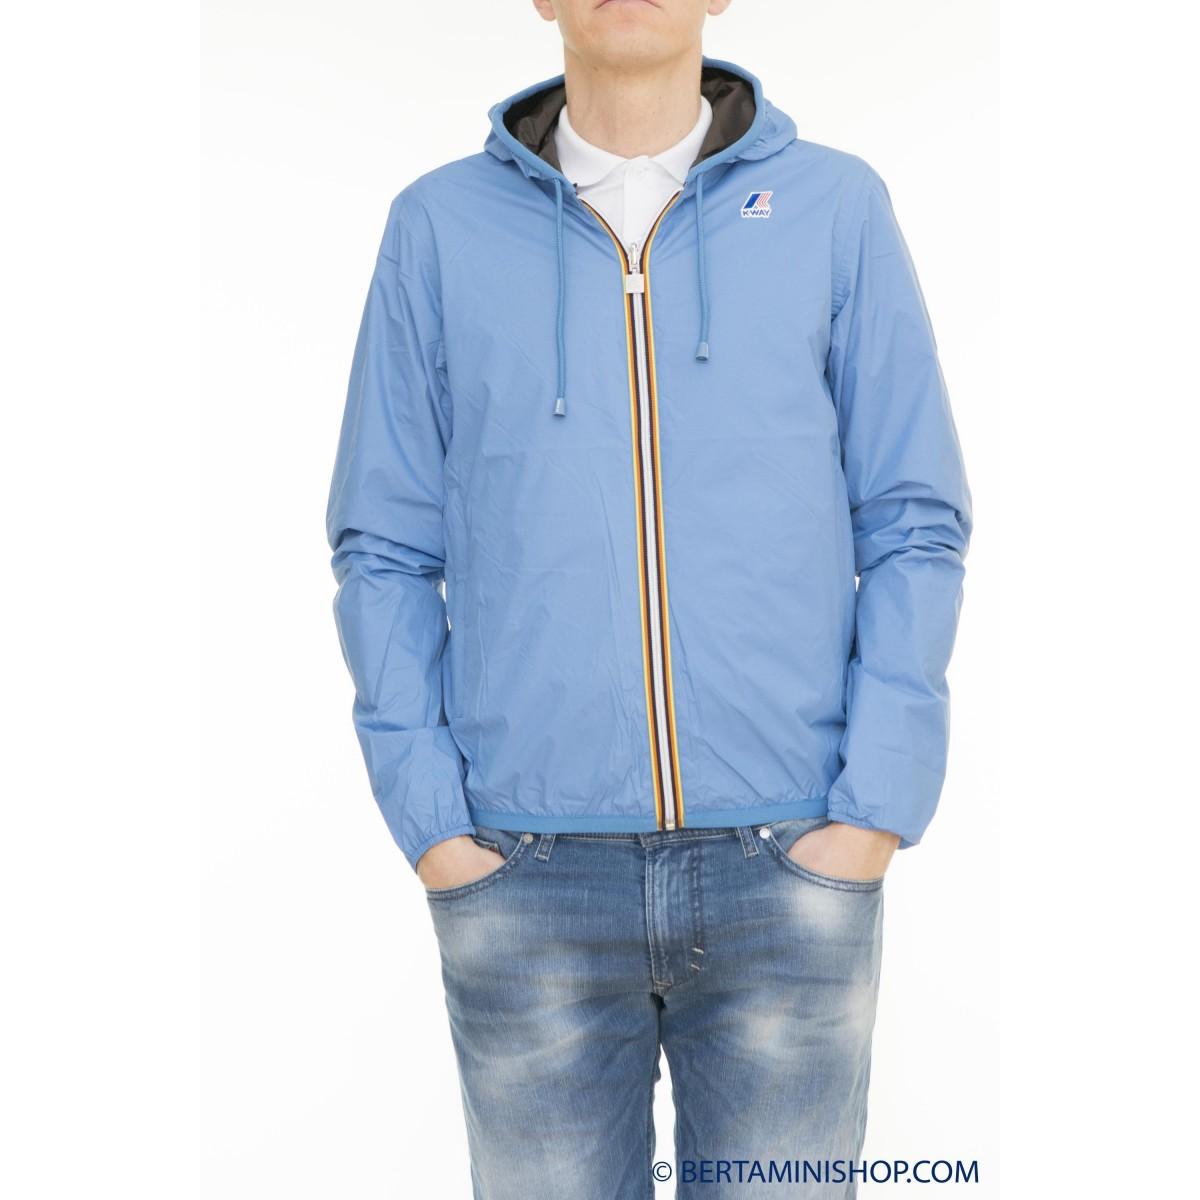 Sports Jacket K-Way Man - Jacques Plus Double K002XP0 937 - Parisian Coffe